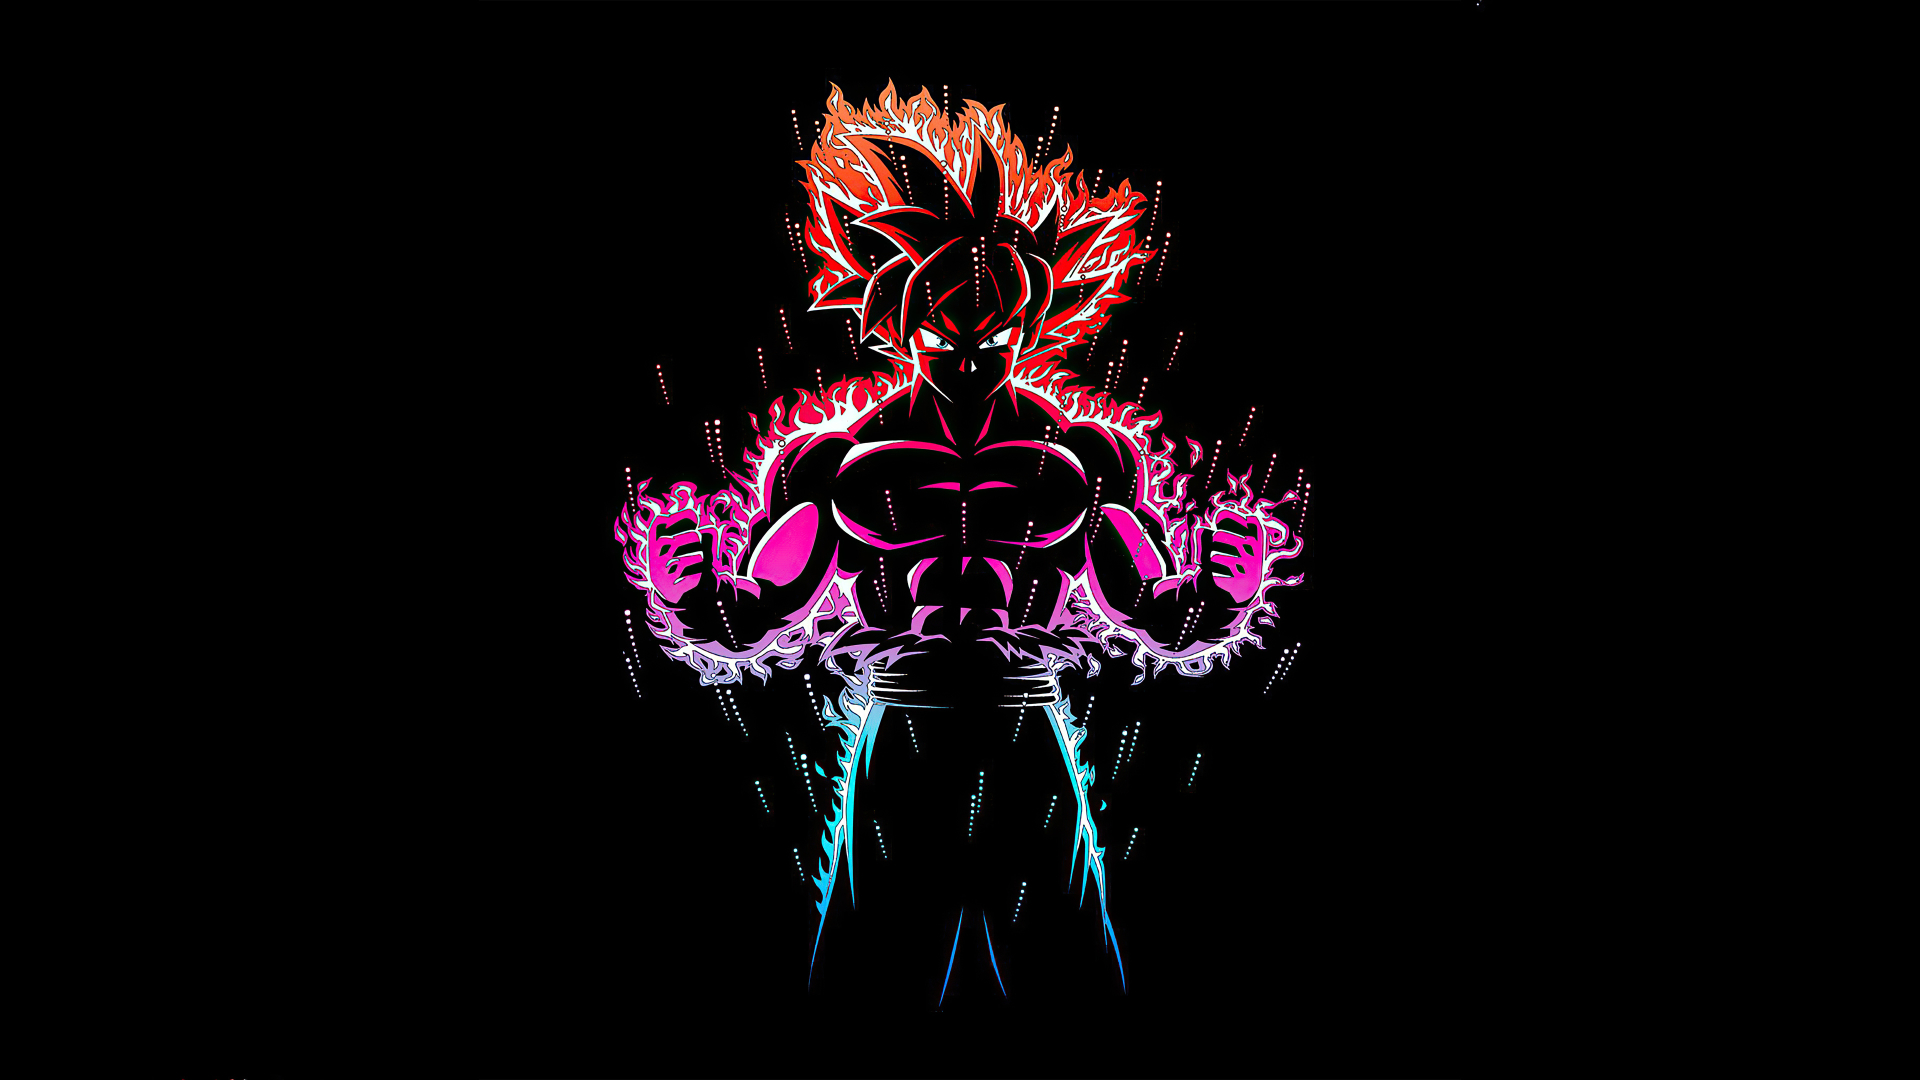 1920x1080 Dragon Ball Z Goku Ultra Instinct Fire 1080P ...